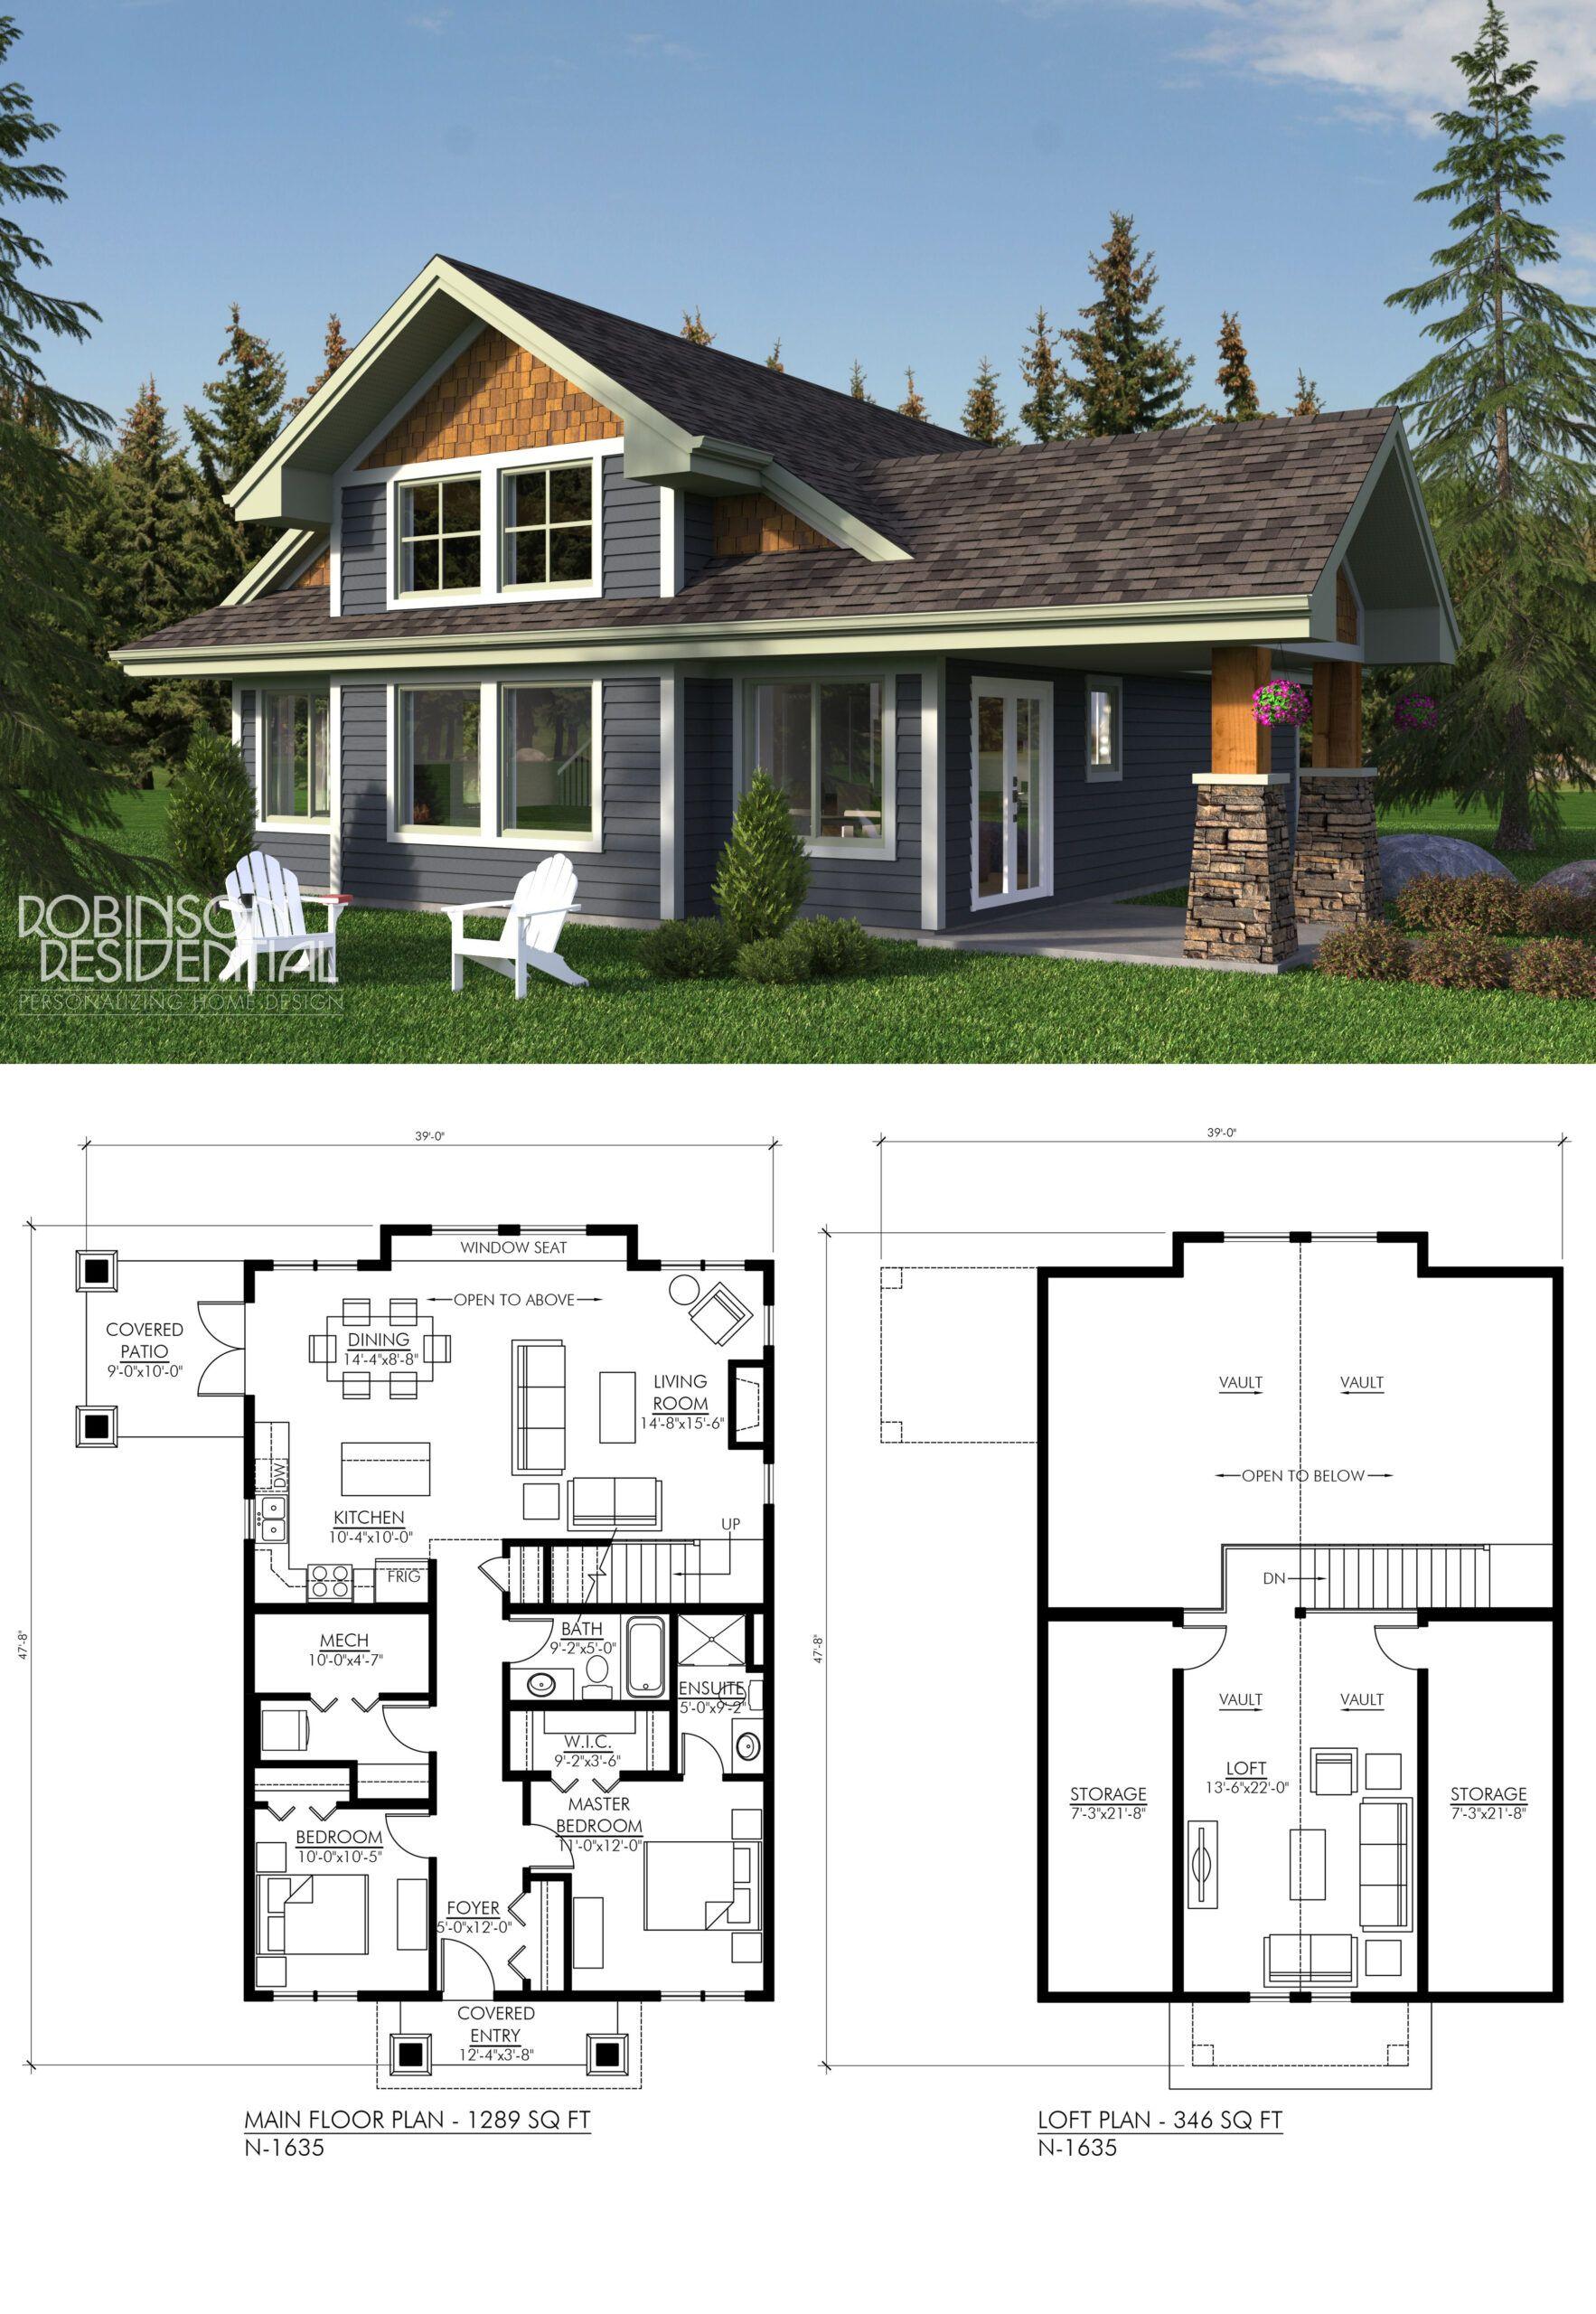 Sip House Plans Craftsman In 2020 Craftsman House Plans Craftsman House House Plans